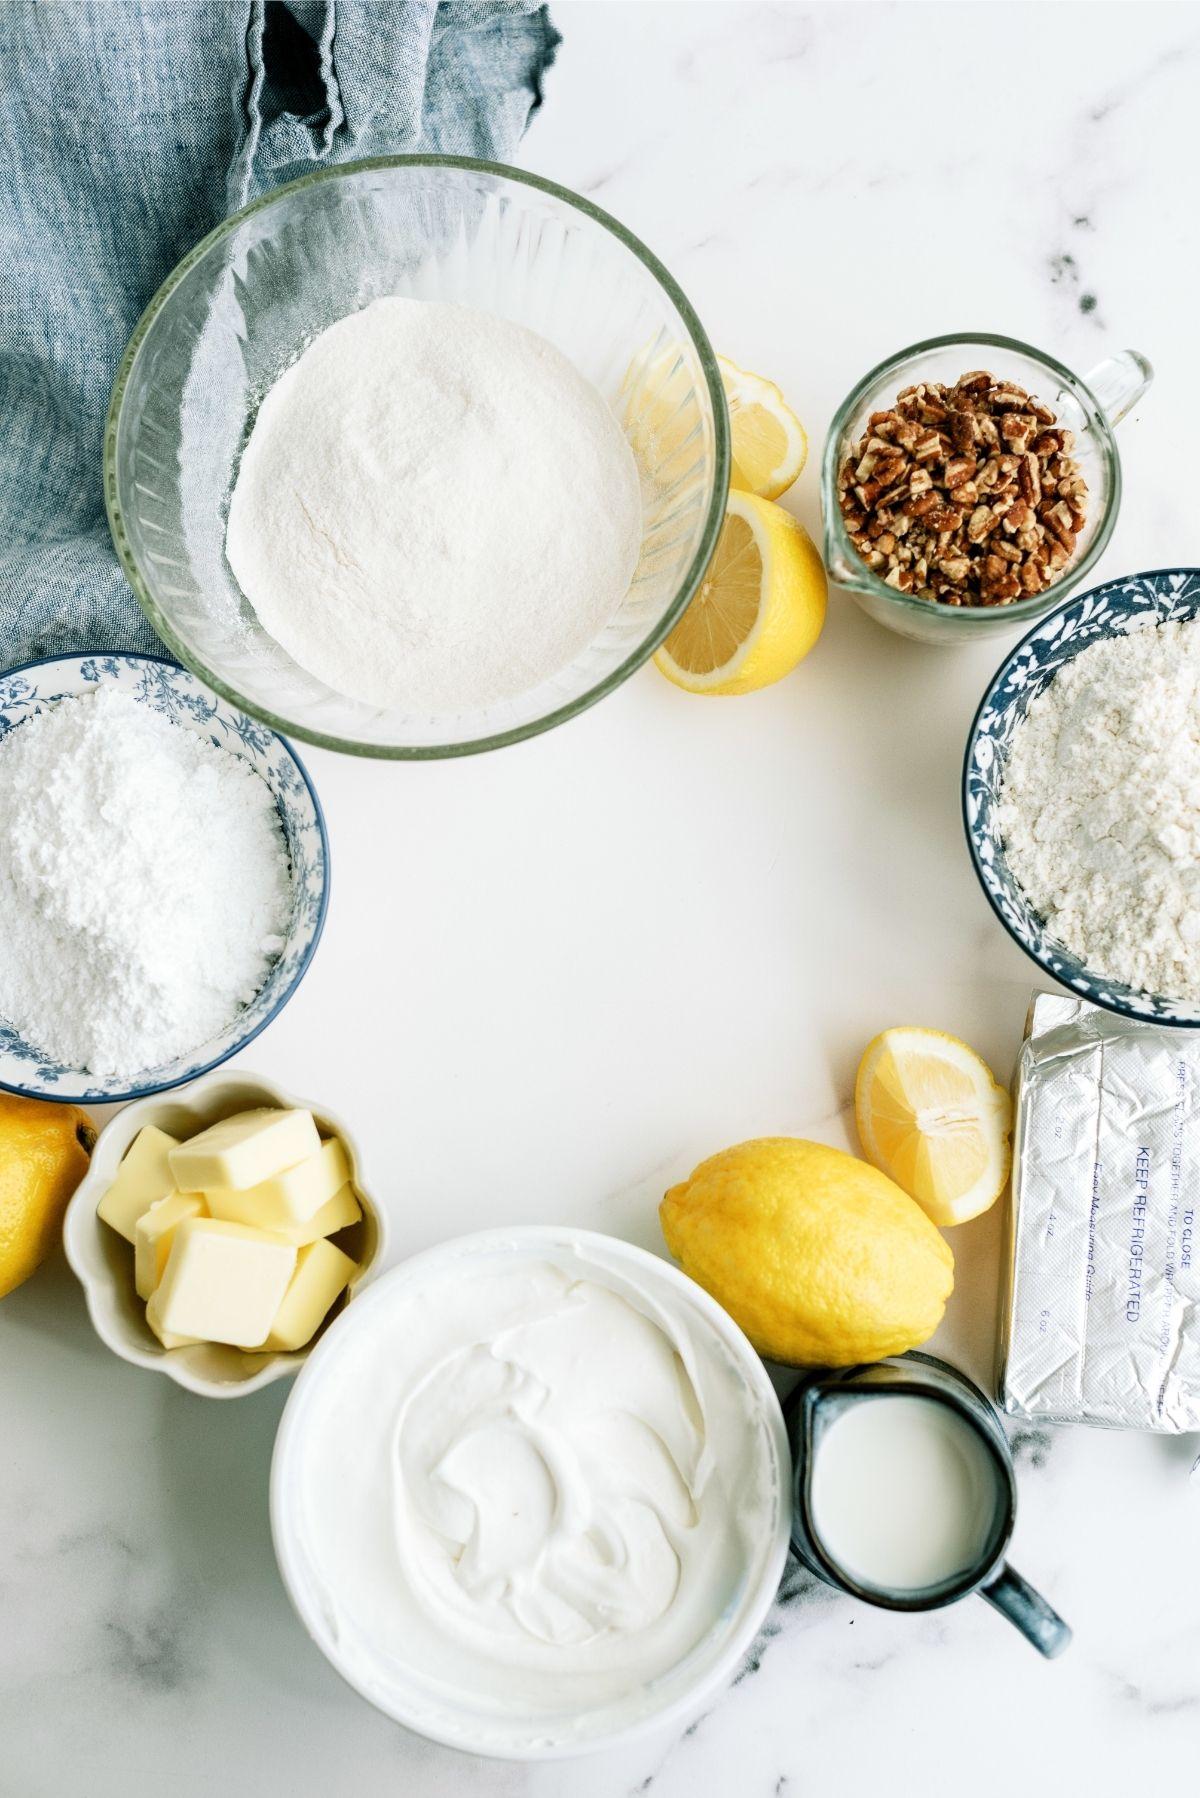 Ingredients for Layered Lemon Dessert